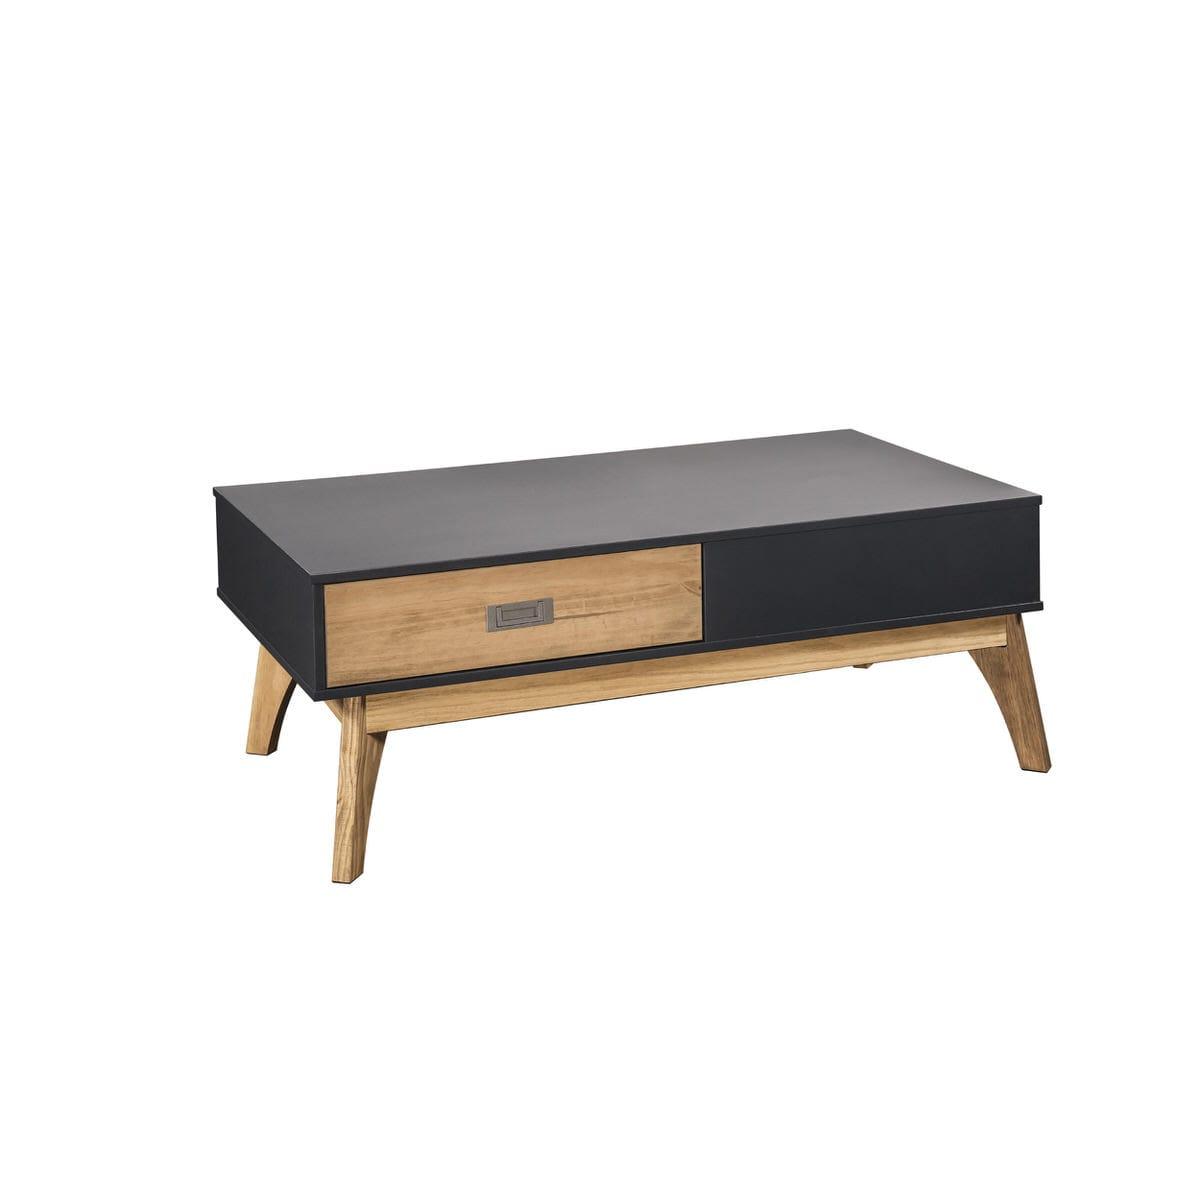 Rustic Mid Century Modern 2 Drawer Jackie 1 0 Dark Grey Natural Wood Coffee Table By Manhattan Comfort